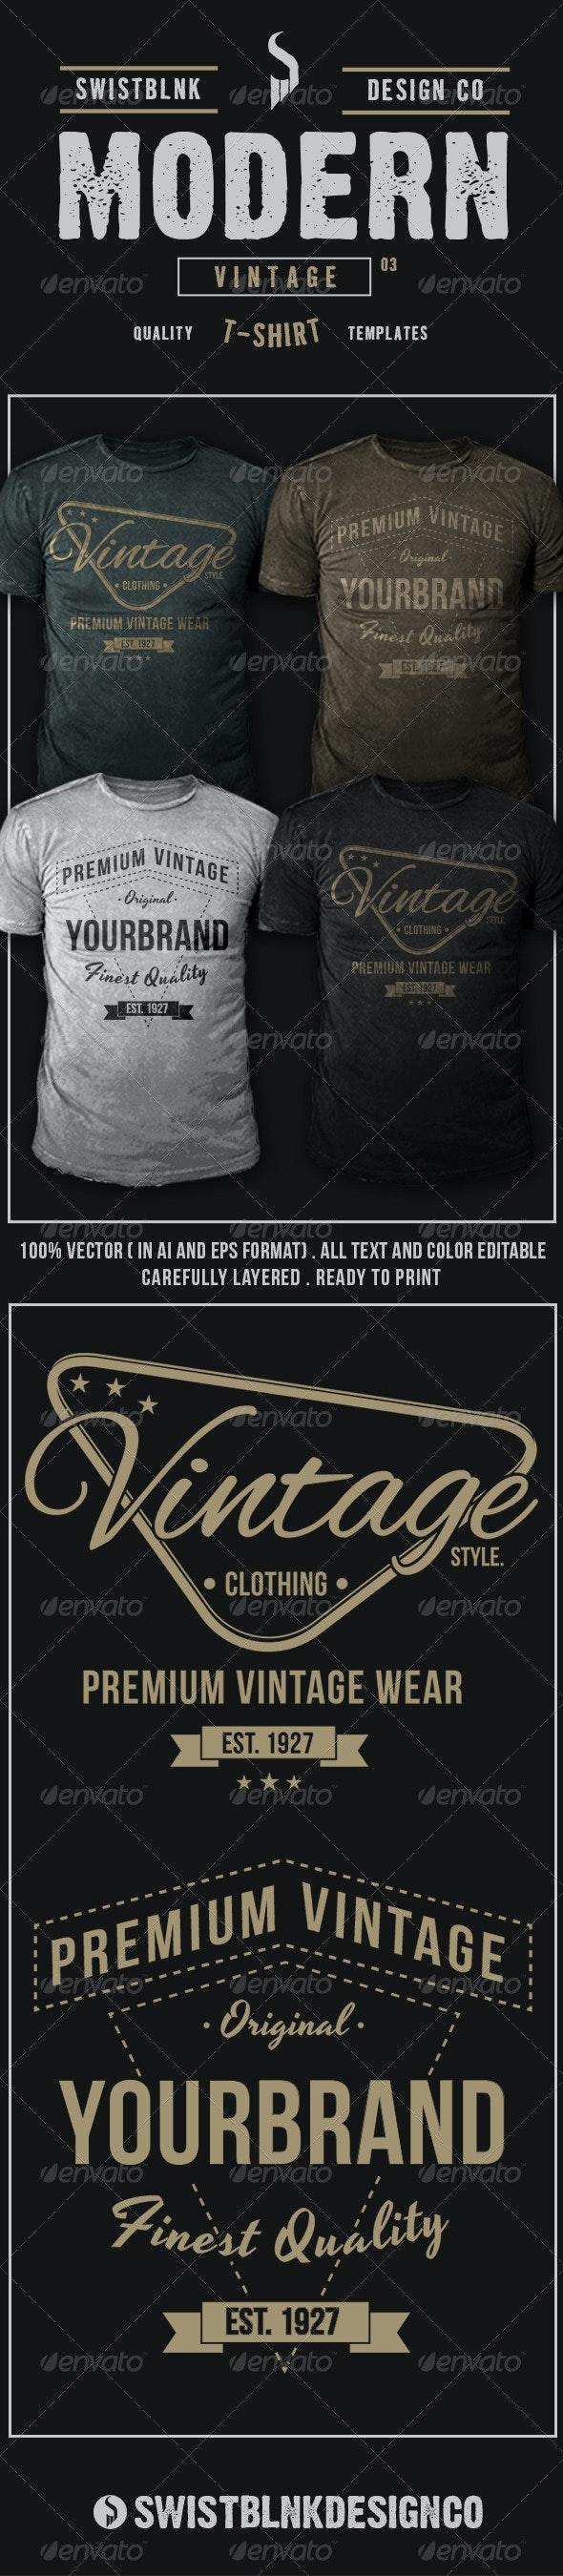 Modern Vintage T-Shirt 03 - Designs T-Shirts